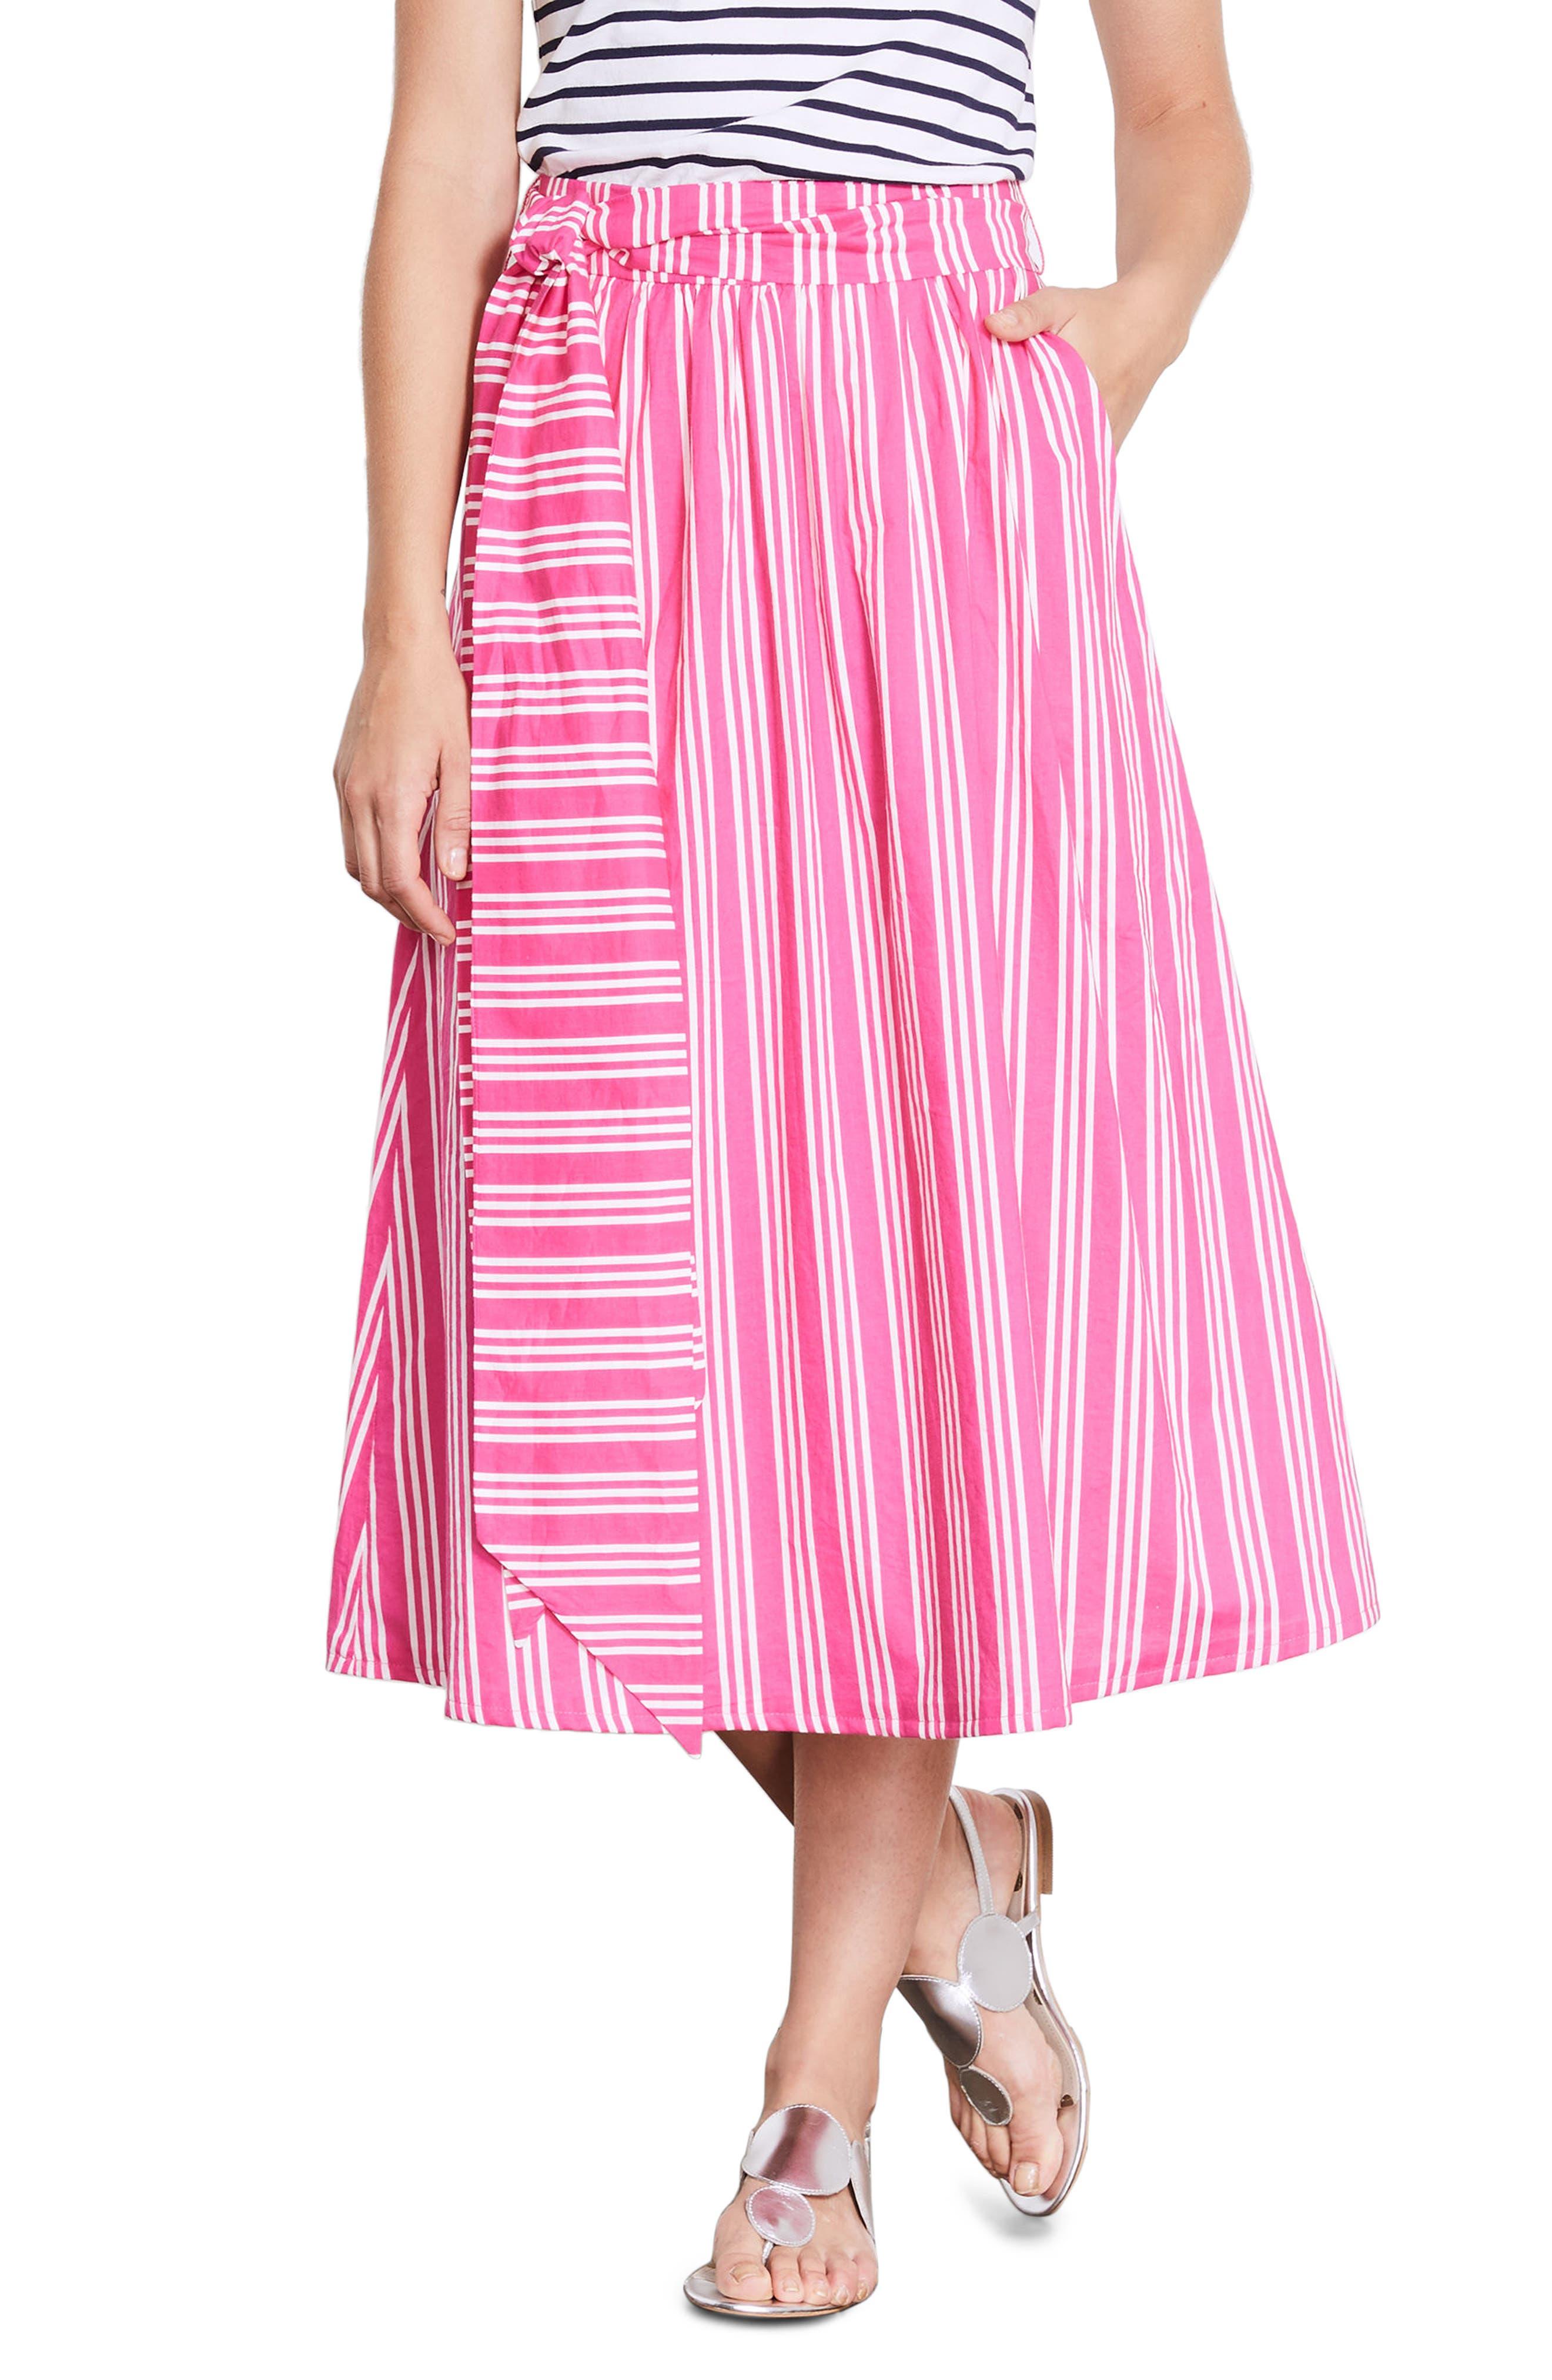 Kiera Midi Skirt,                             Main thumbnail 1, color,                             Party Pink And Ecru